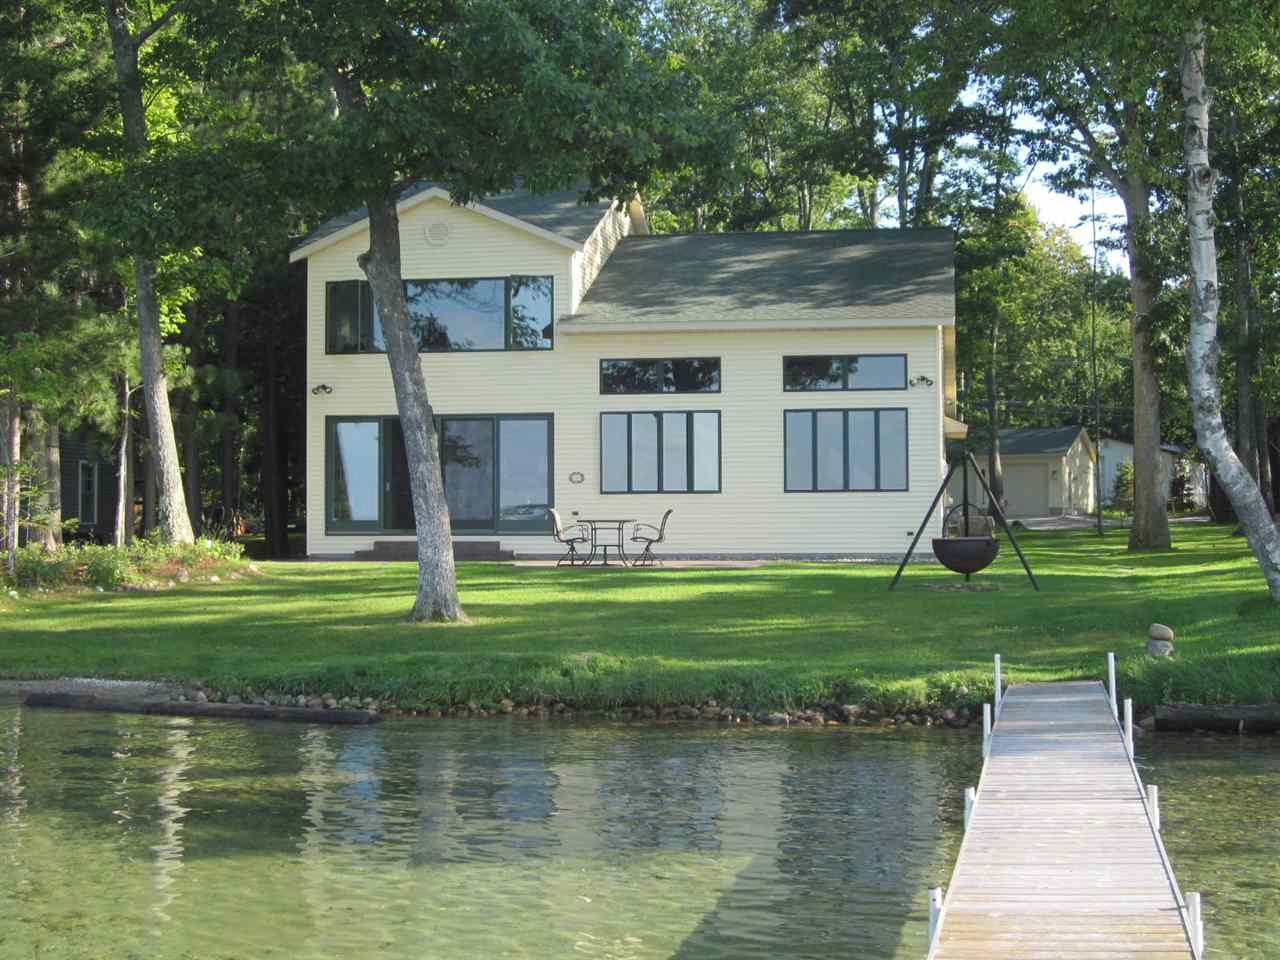 Real Estate for Sale, ListingId: 32890366, Roscommon,MI48653